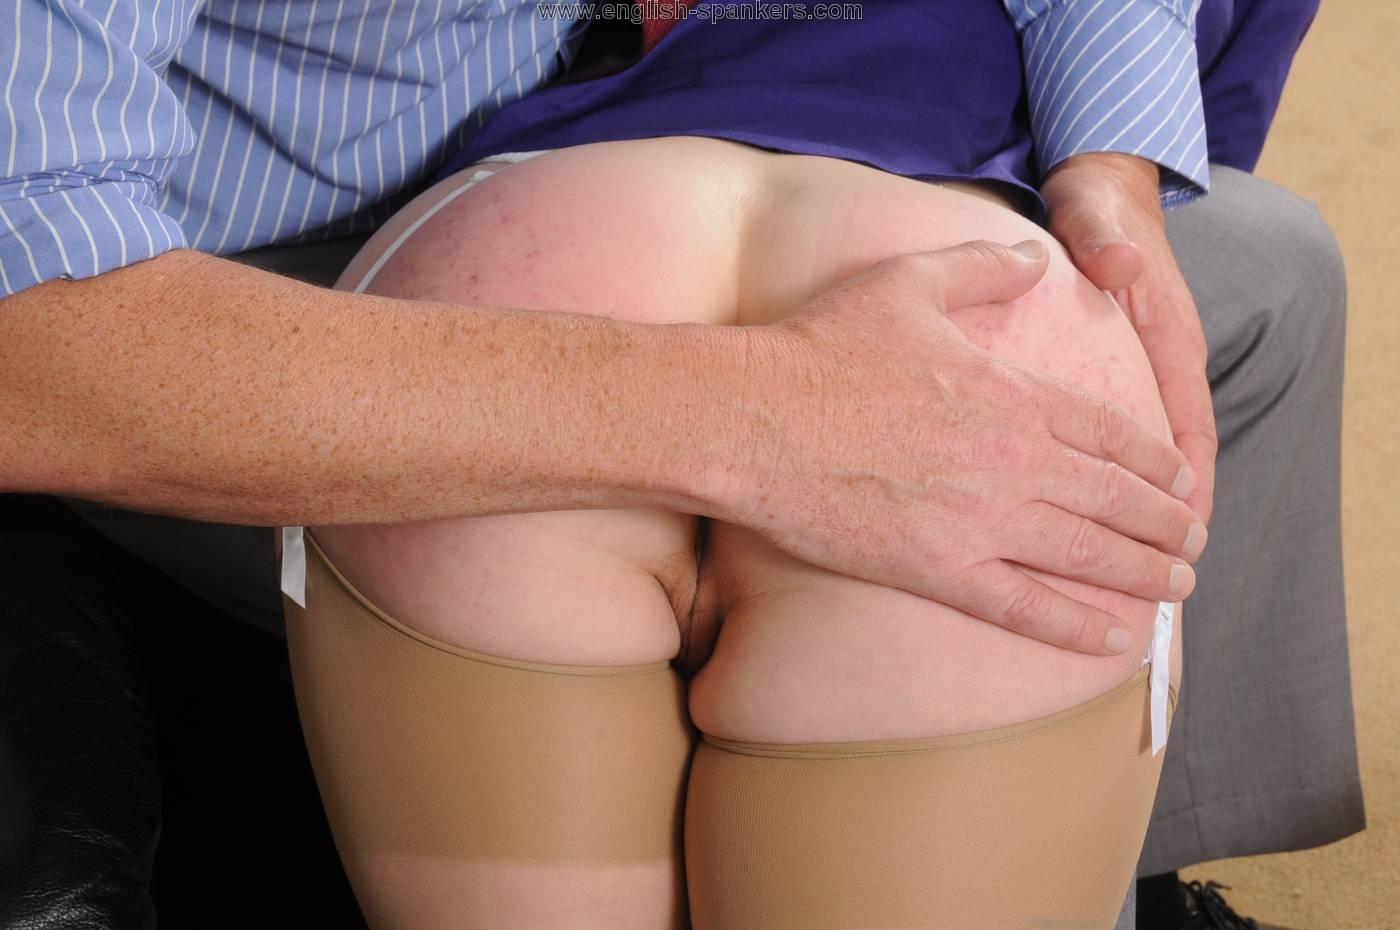 secretary spanking videos